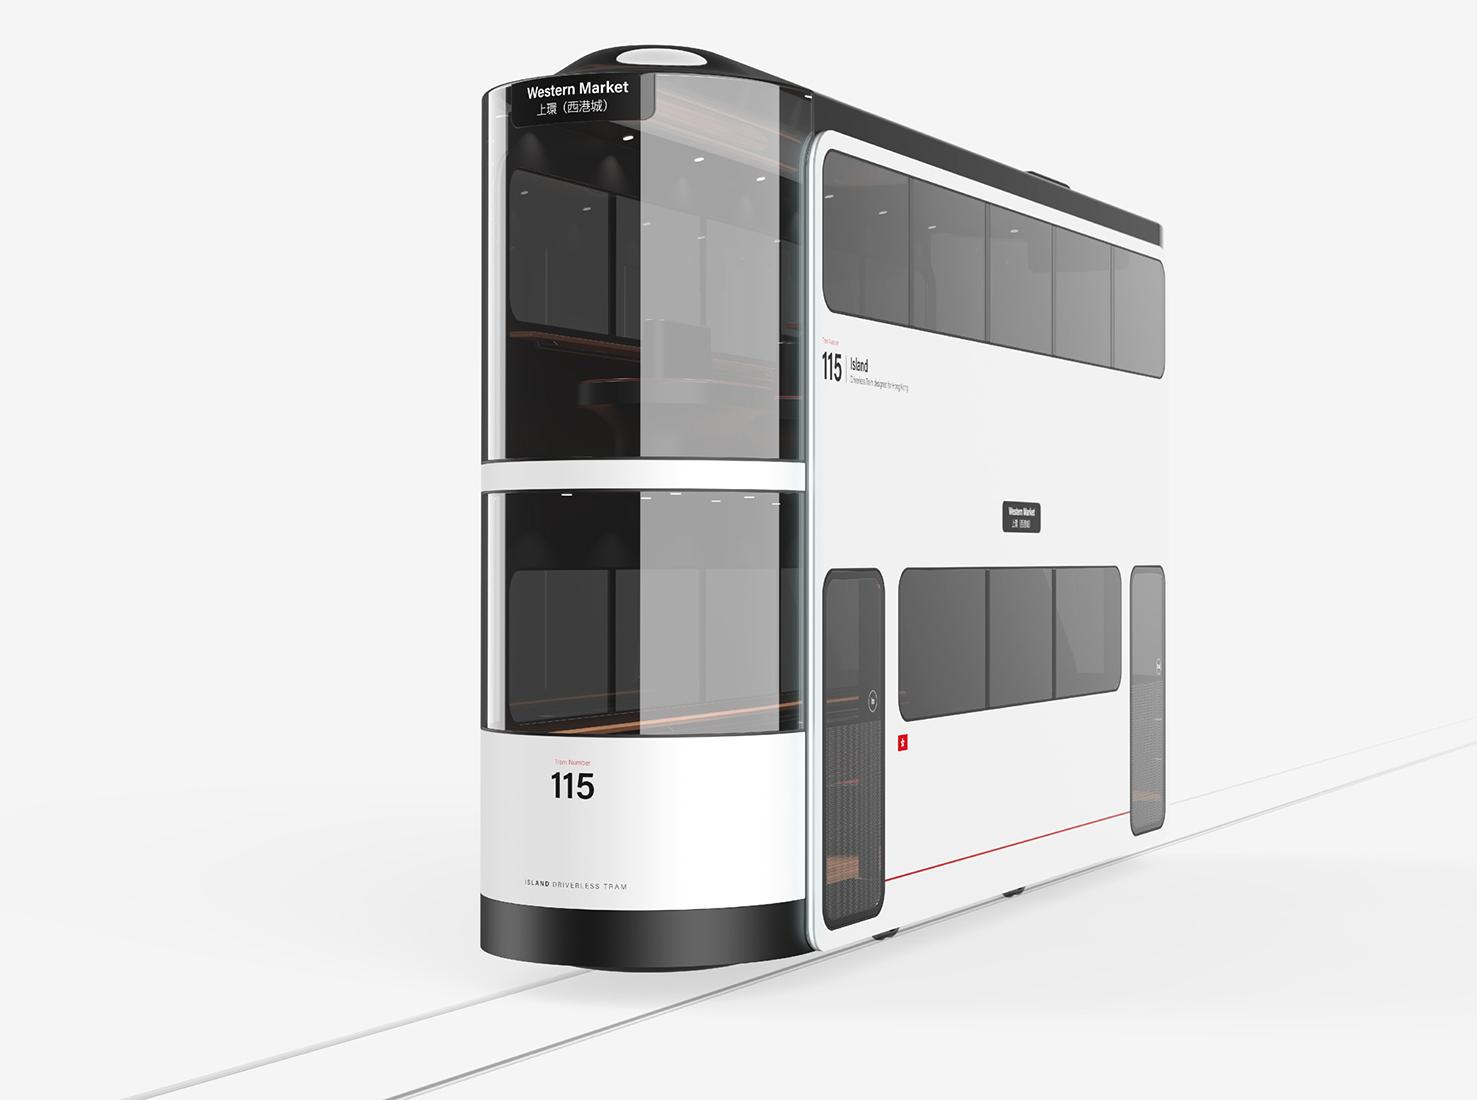 новые трамваи фото